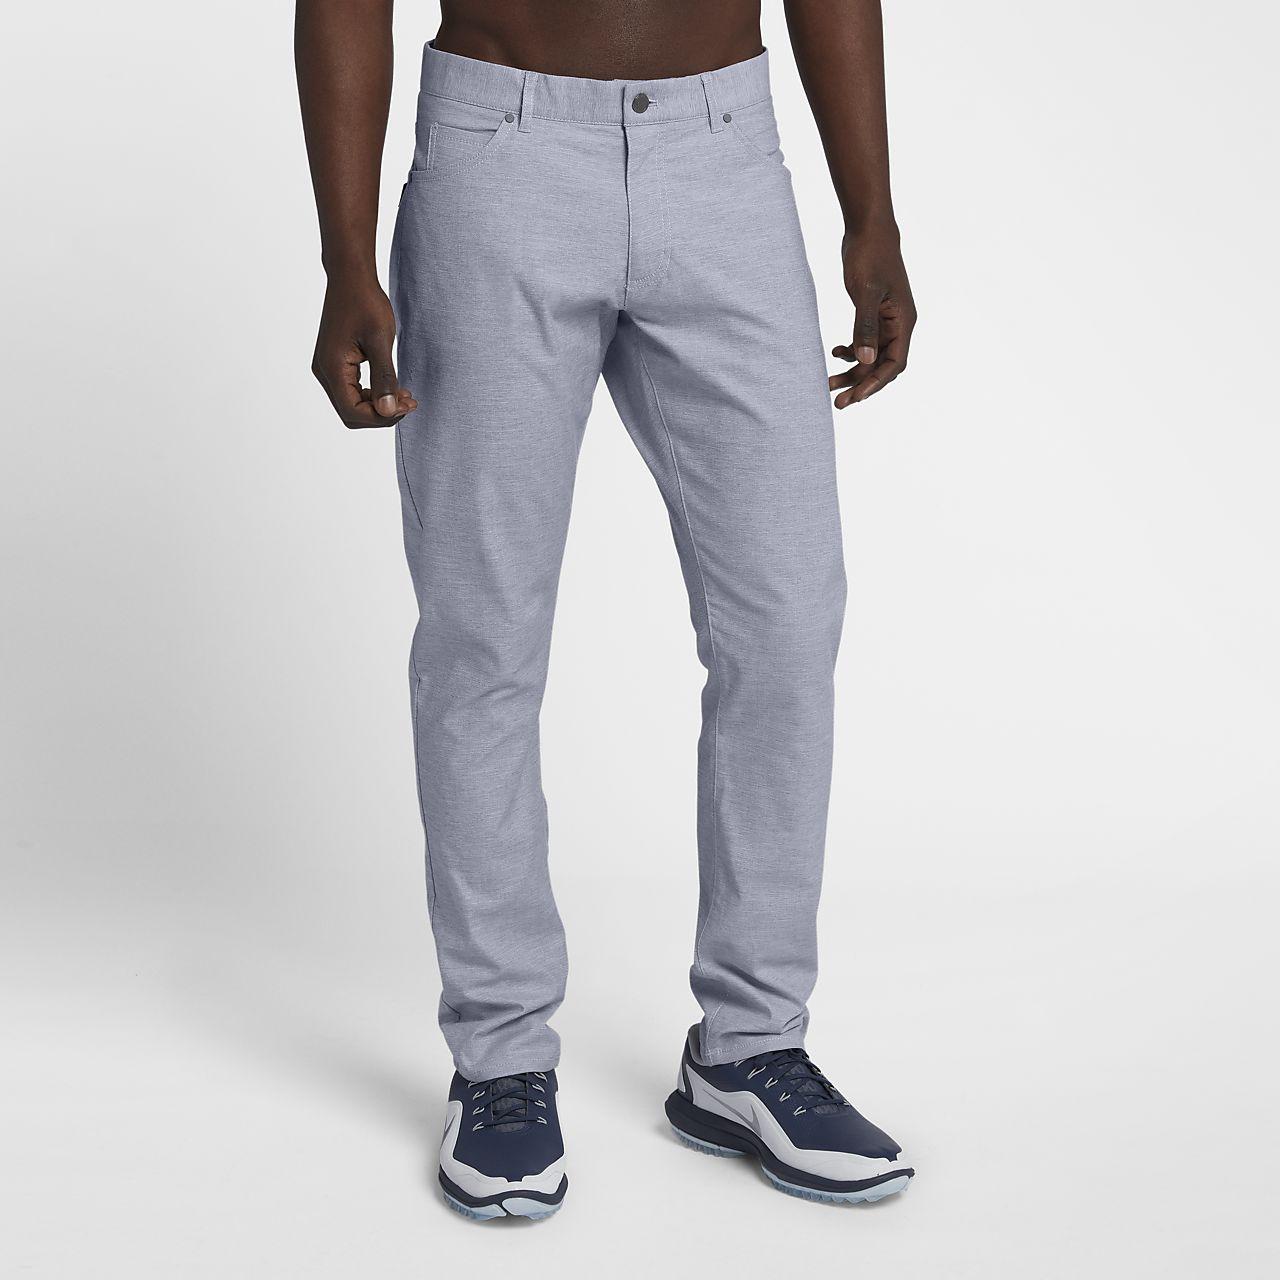 cc3a42ef939 Nike Flex Men s Slim-Fit 5-Pocket Golf Trousers. Nike.com CA